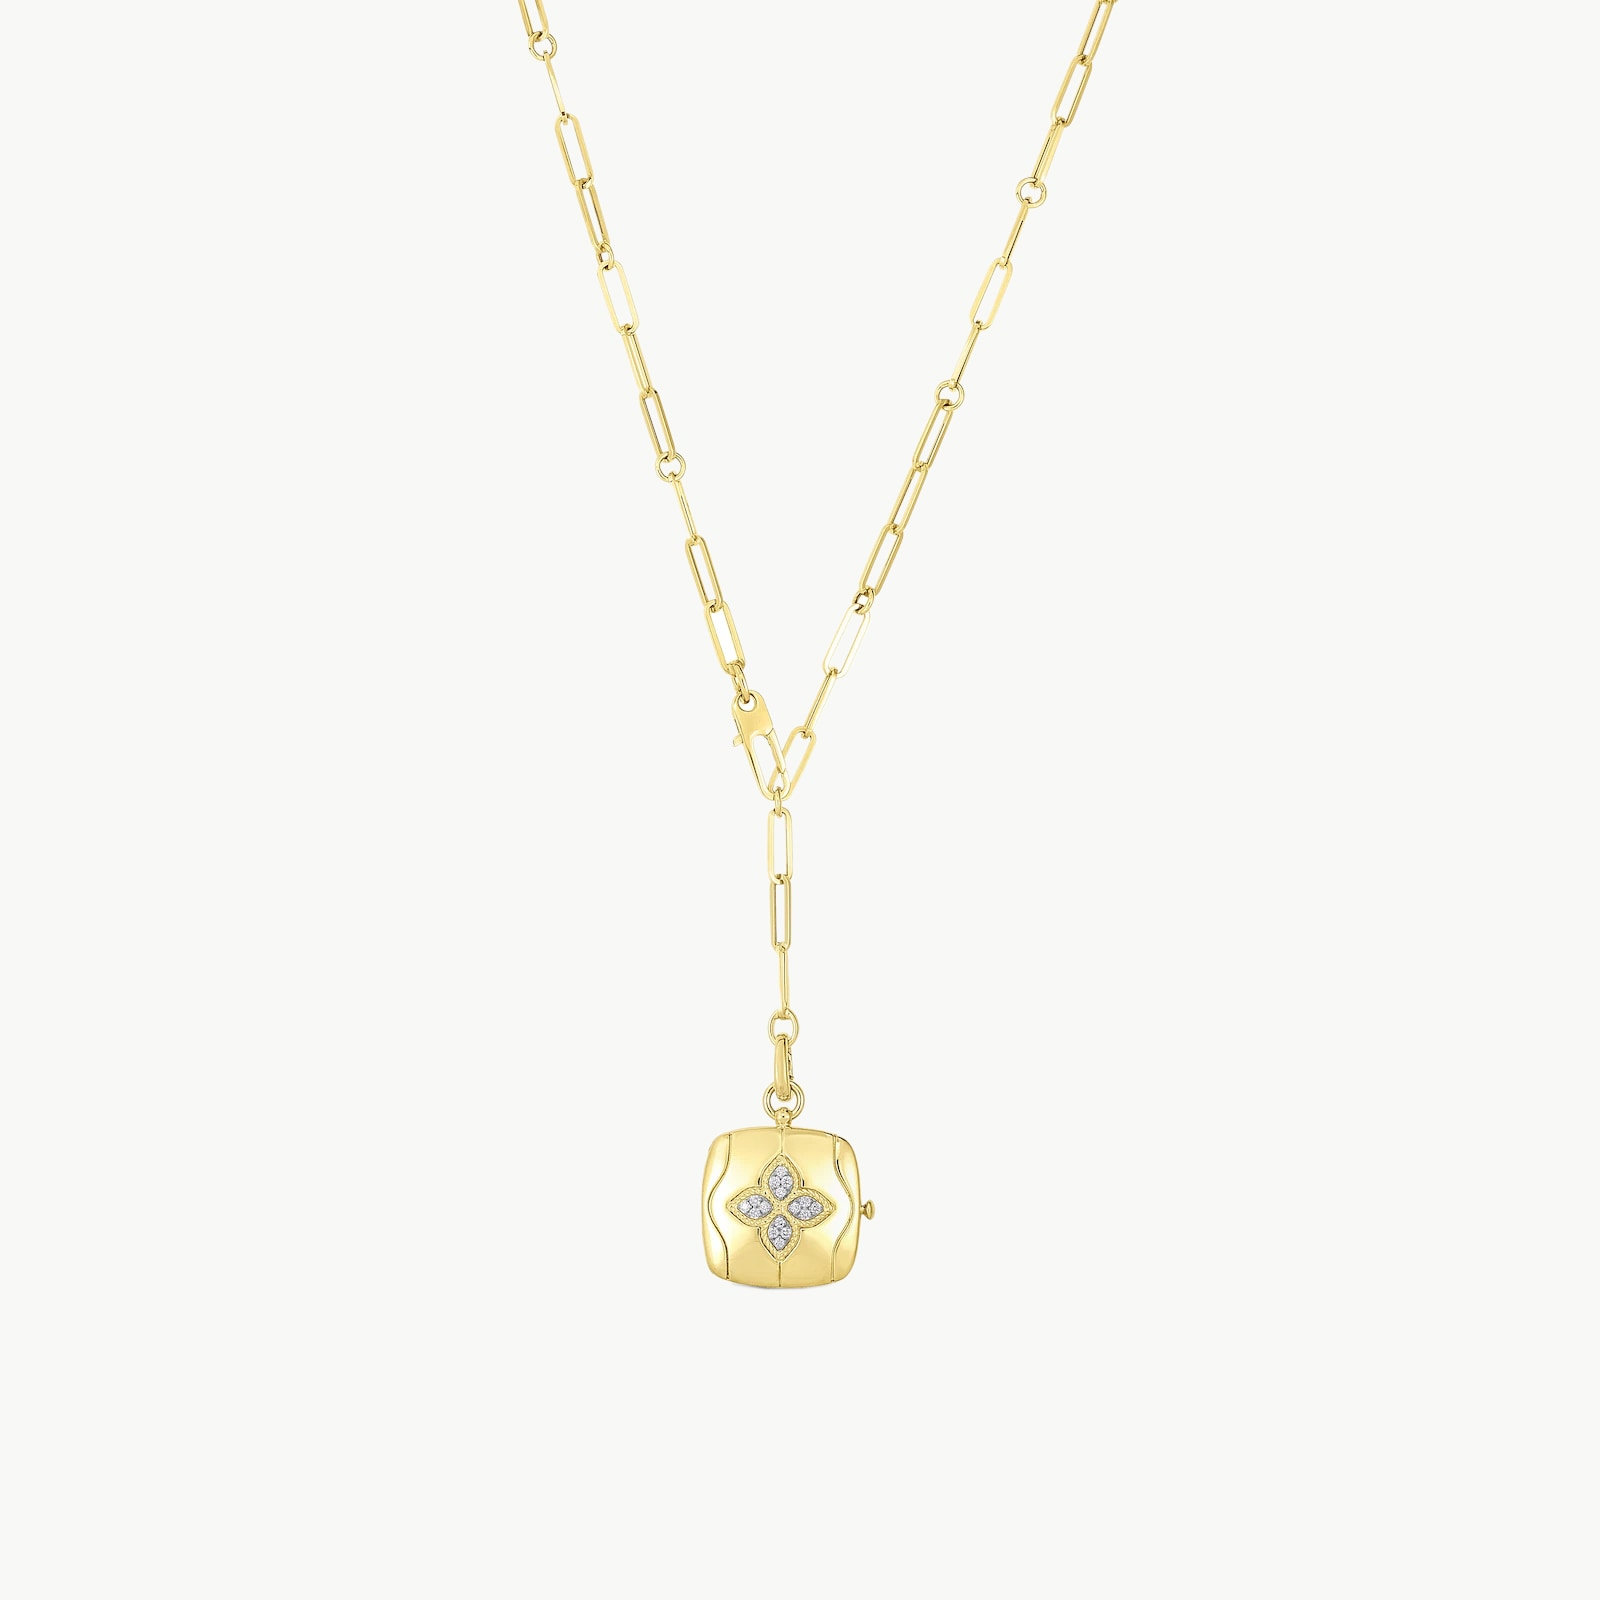 18k Yellow Gold 0.18cttw Diamond Medallion Necklace